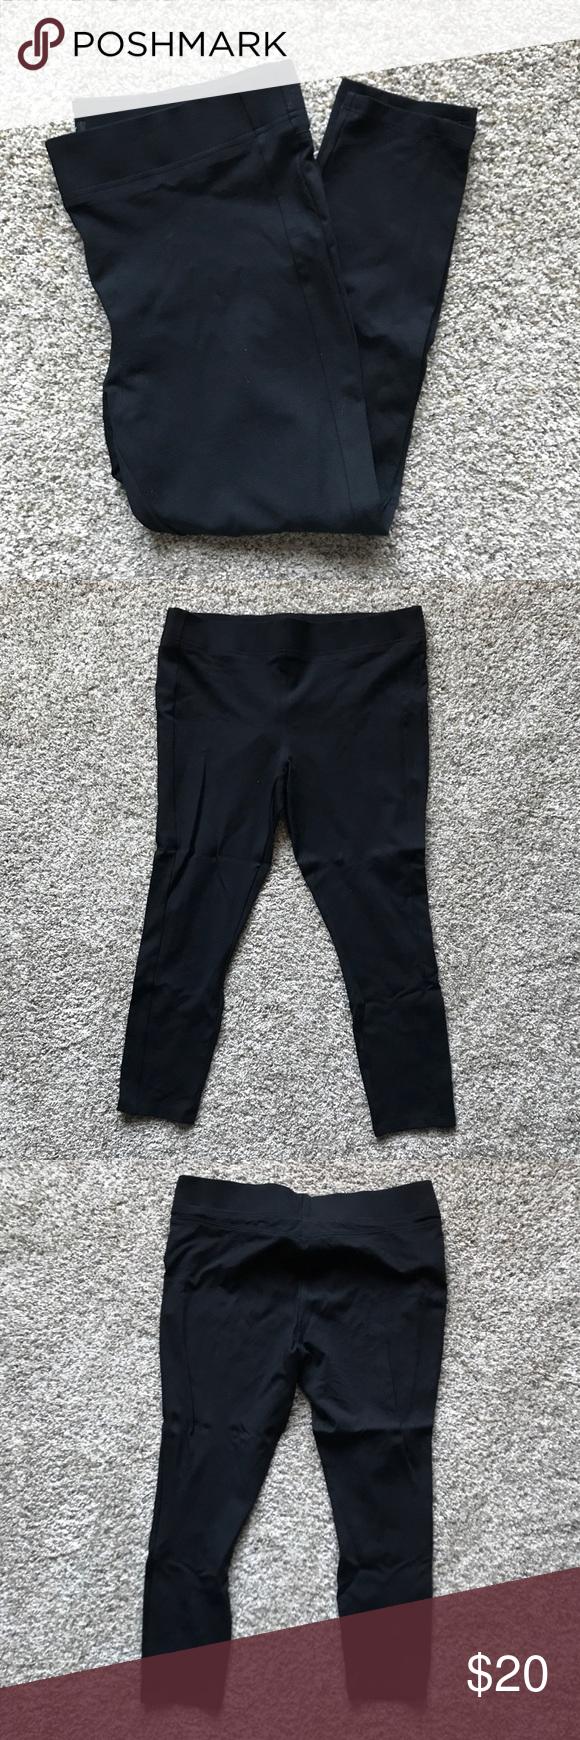 EUC Loft Seamed Leggings - Black - XL Black ponte ankle pant/ Legging. Seaming adds stylish detail. LOFT Pants